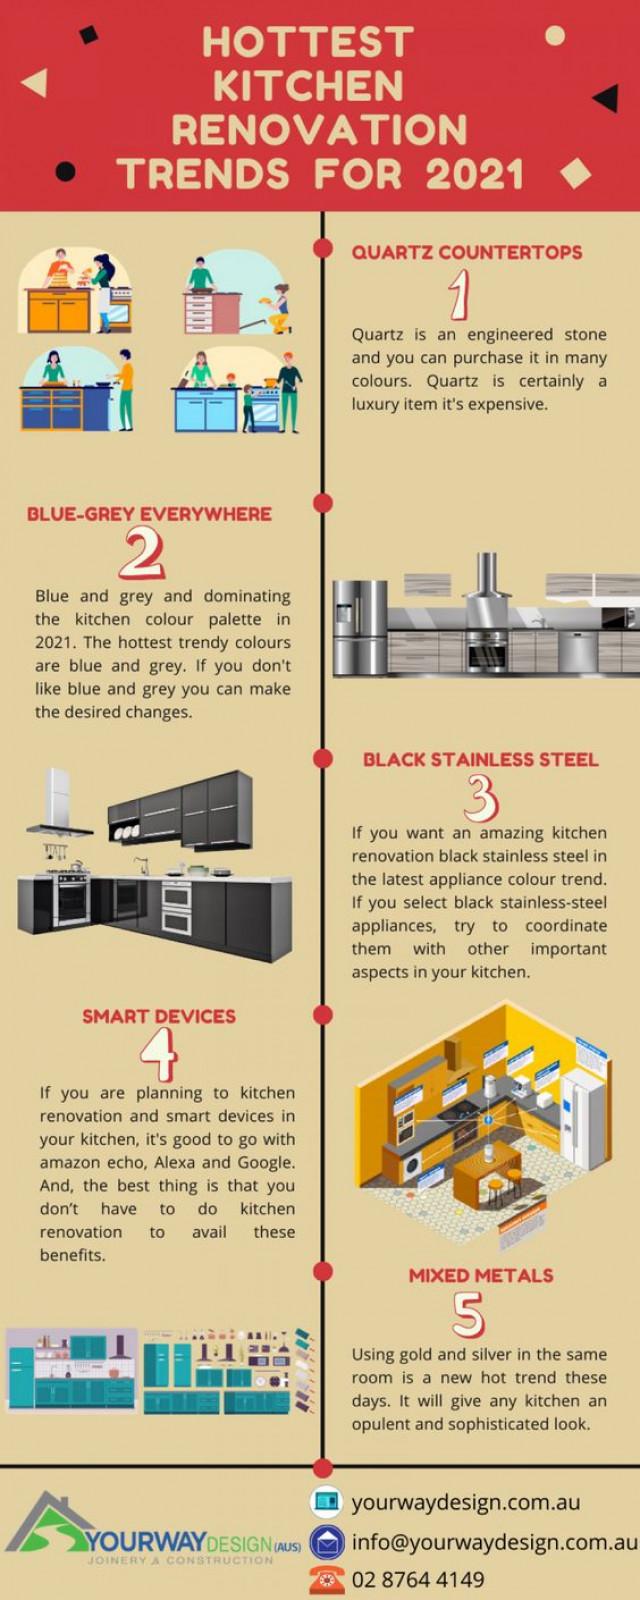 Hottest kitchen renovation trends for 2021